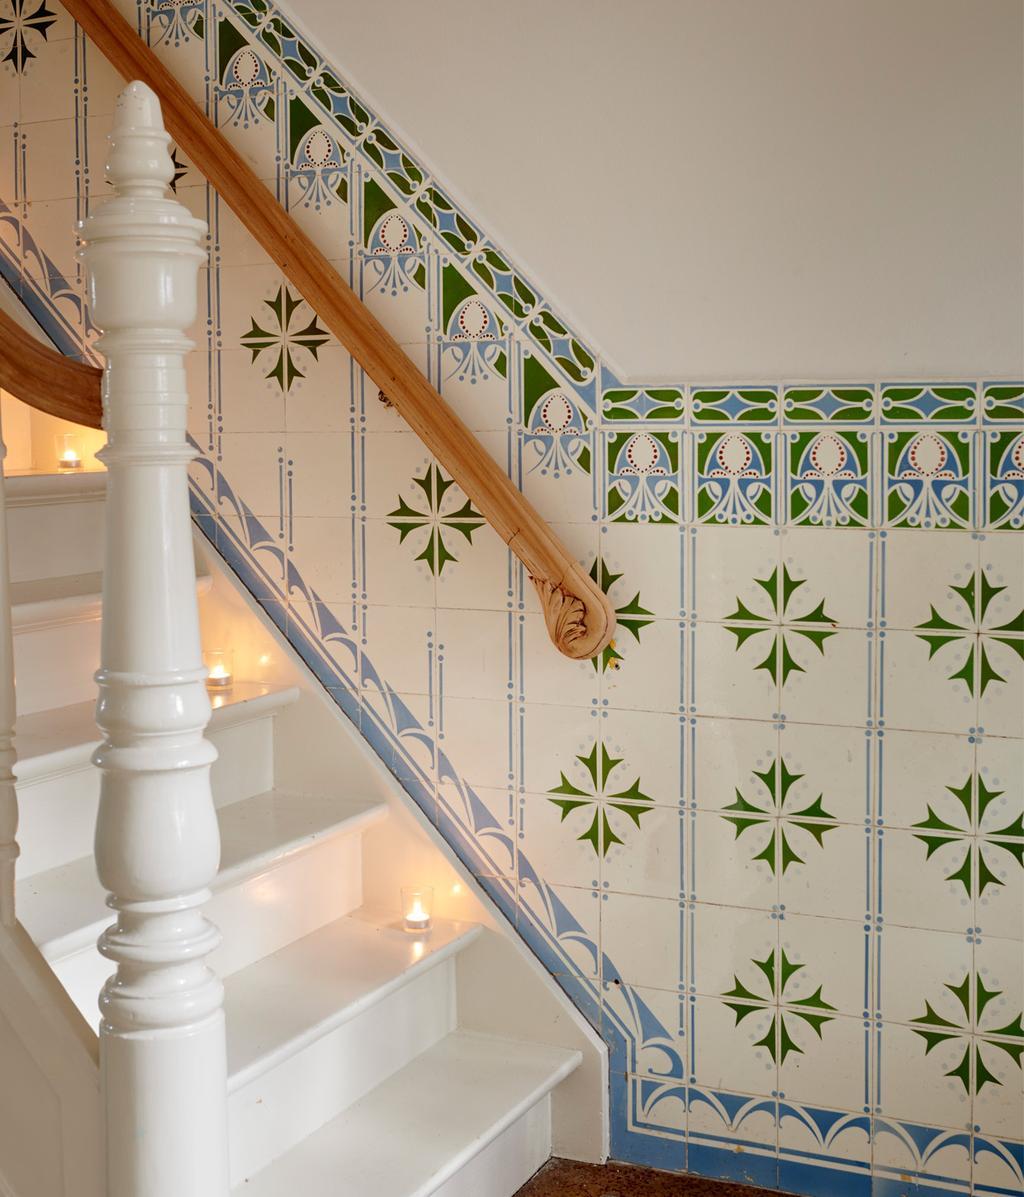 Feestelijke trap | Haarlem | vtwonen 12-2020